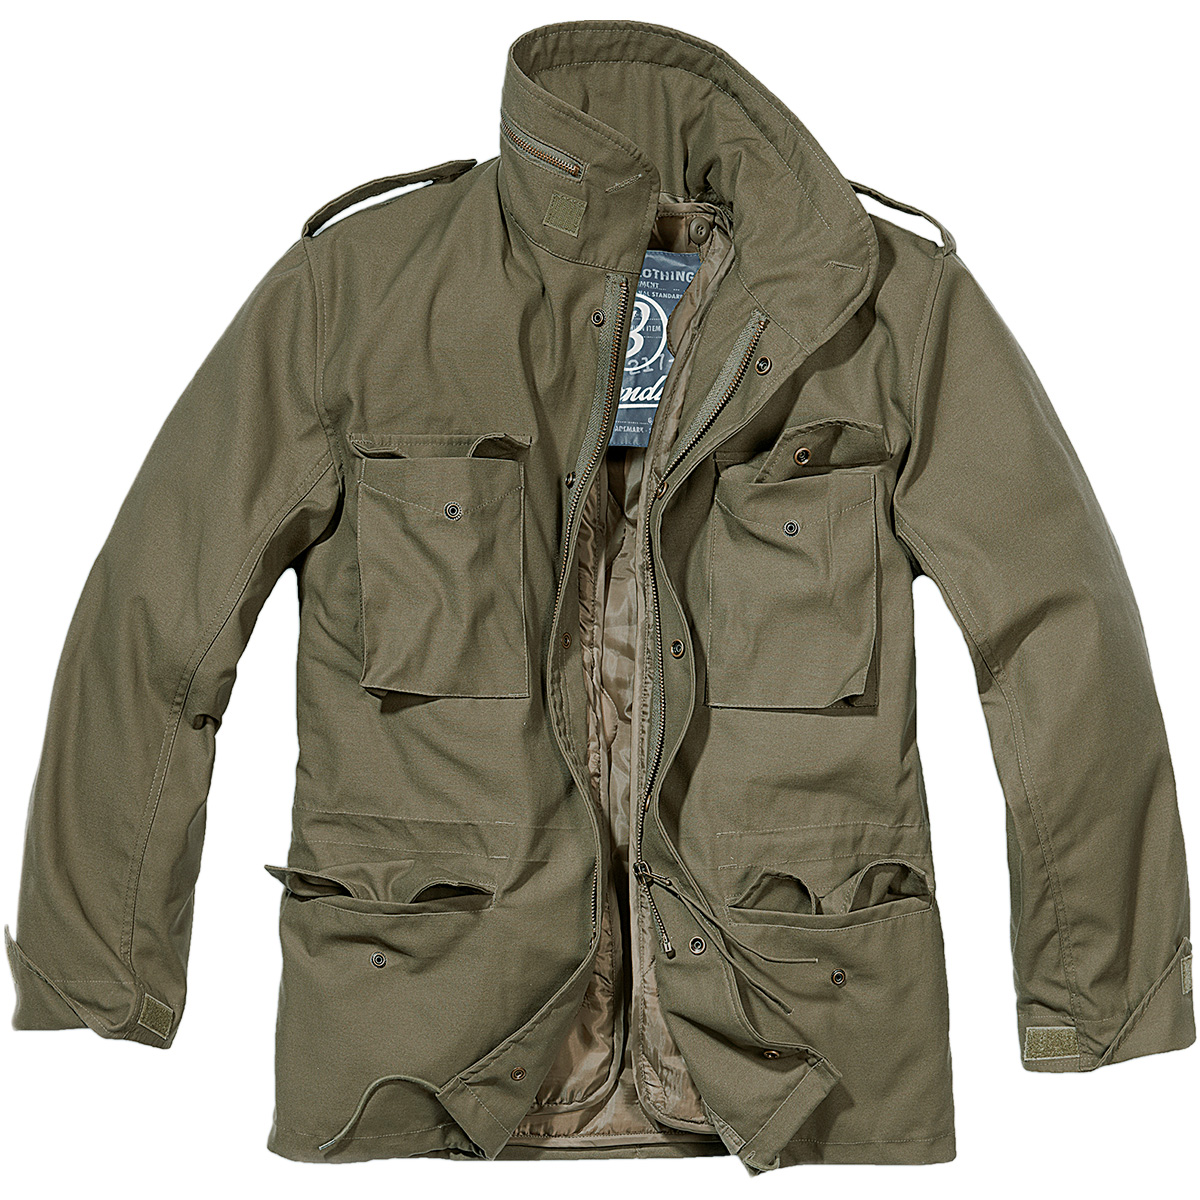 brandit classic m65 mens army field jacket warm travel parka military coat olive ebay. Black Bedroom Furniture Sets. Home Design Ideas